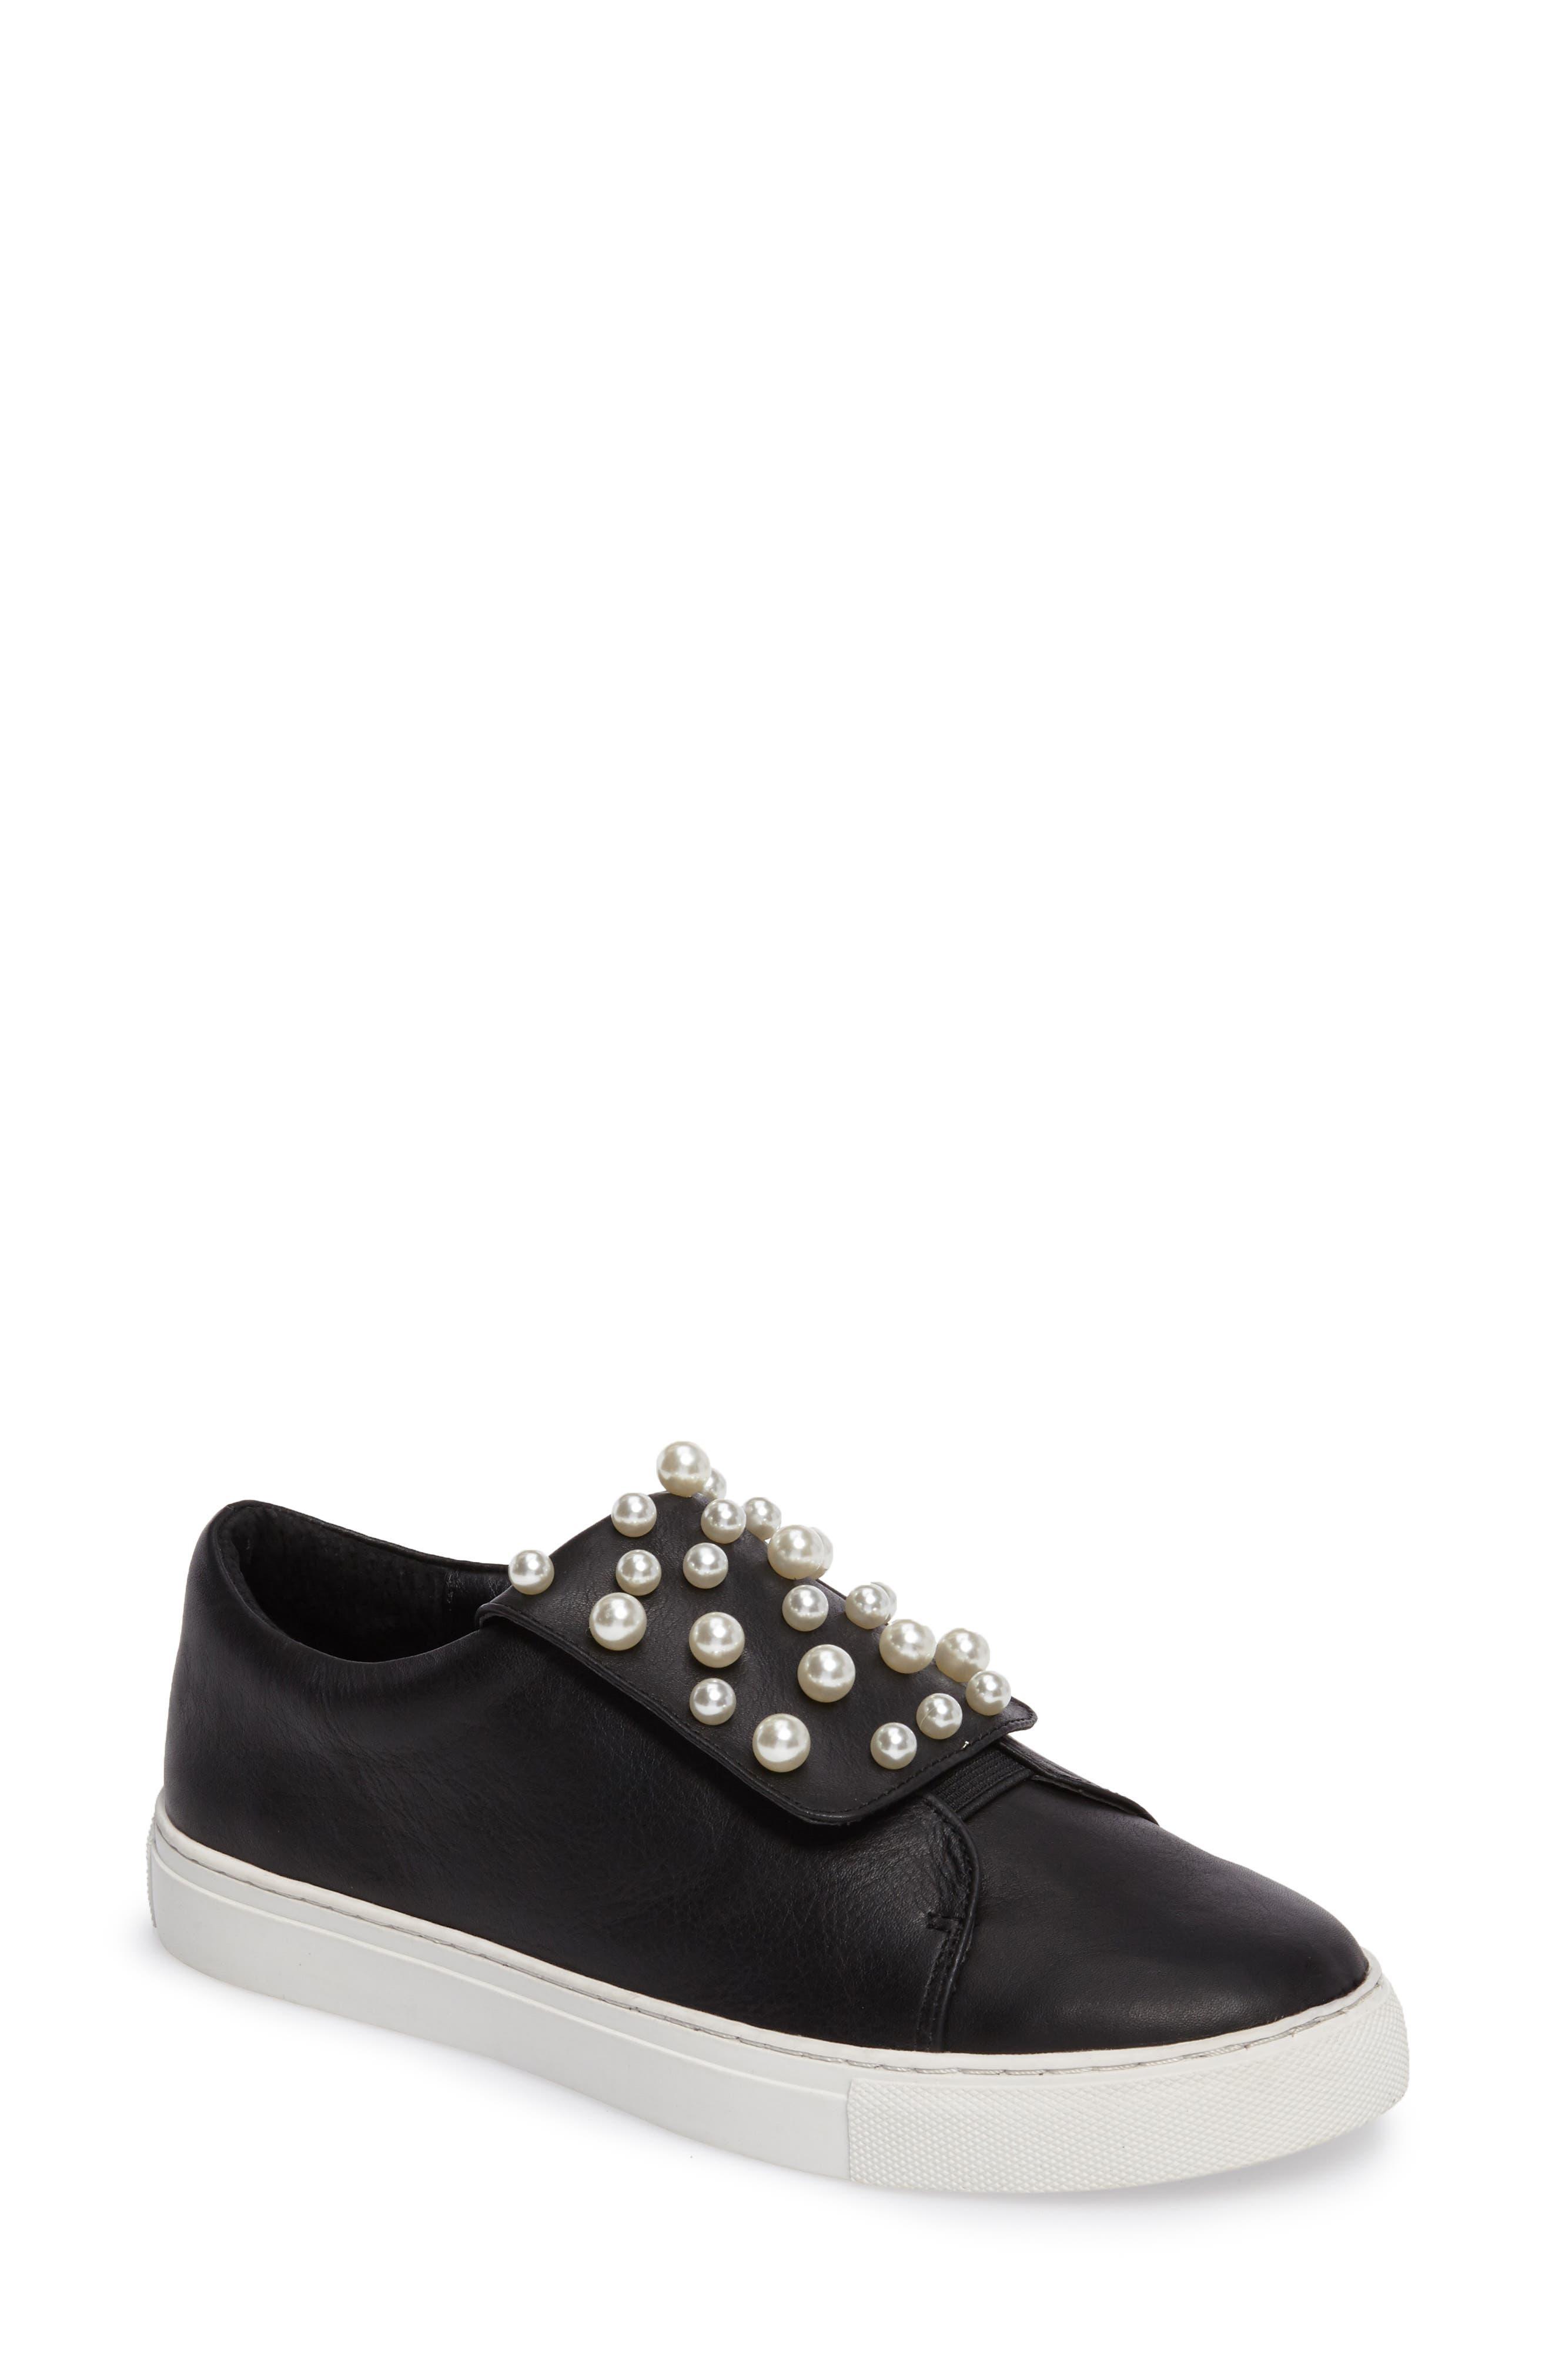 E8 by Miista Hadi Imitation Pearl Embellished Platorm Sneaker (Women)